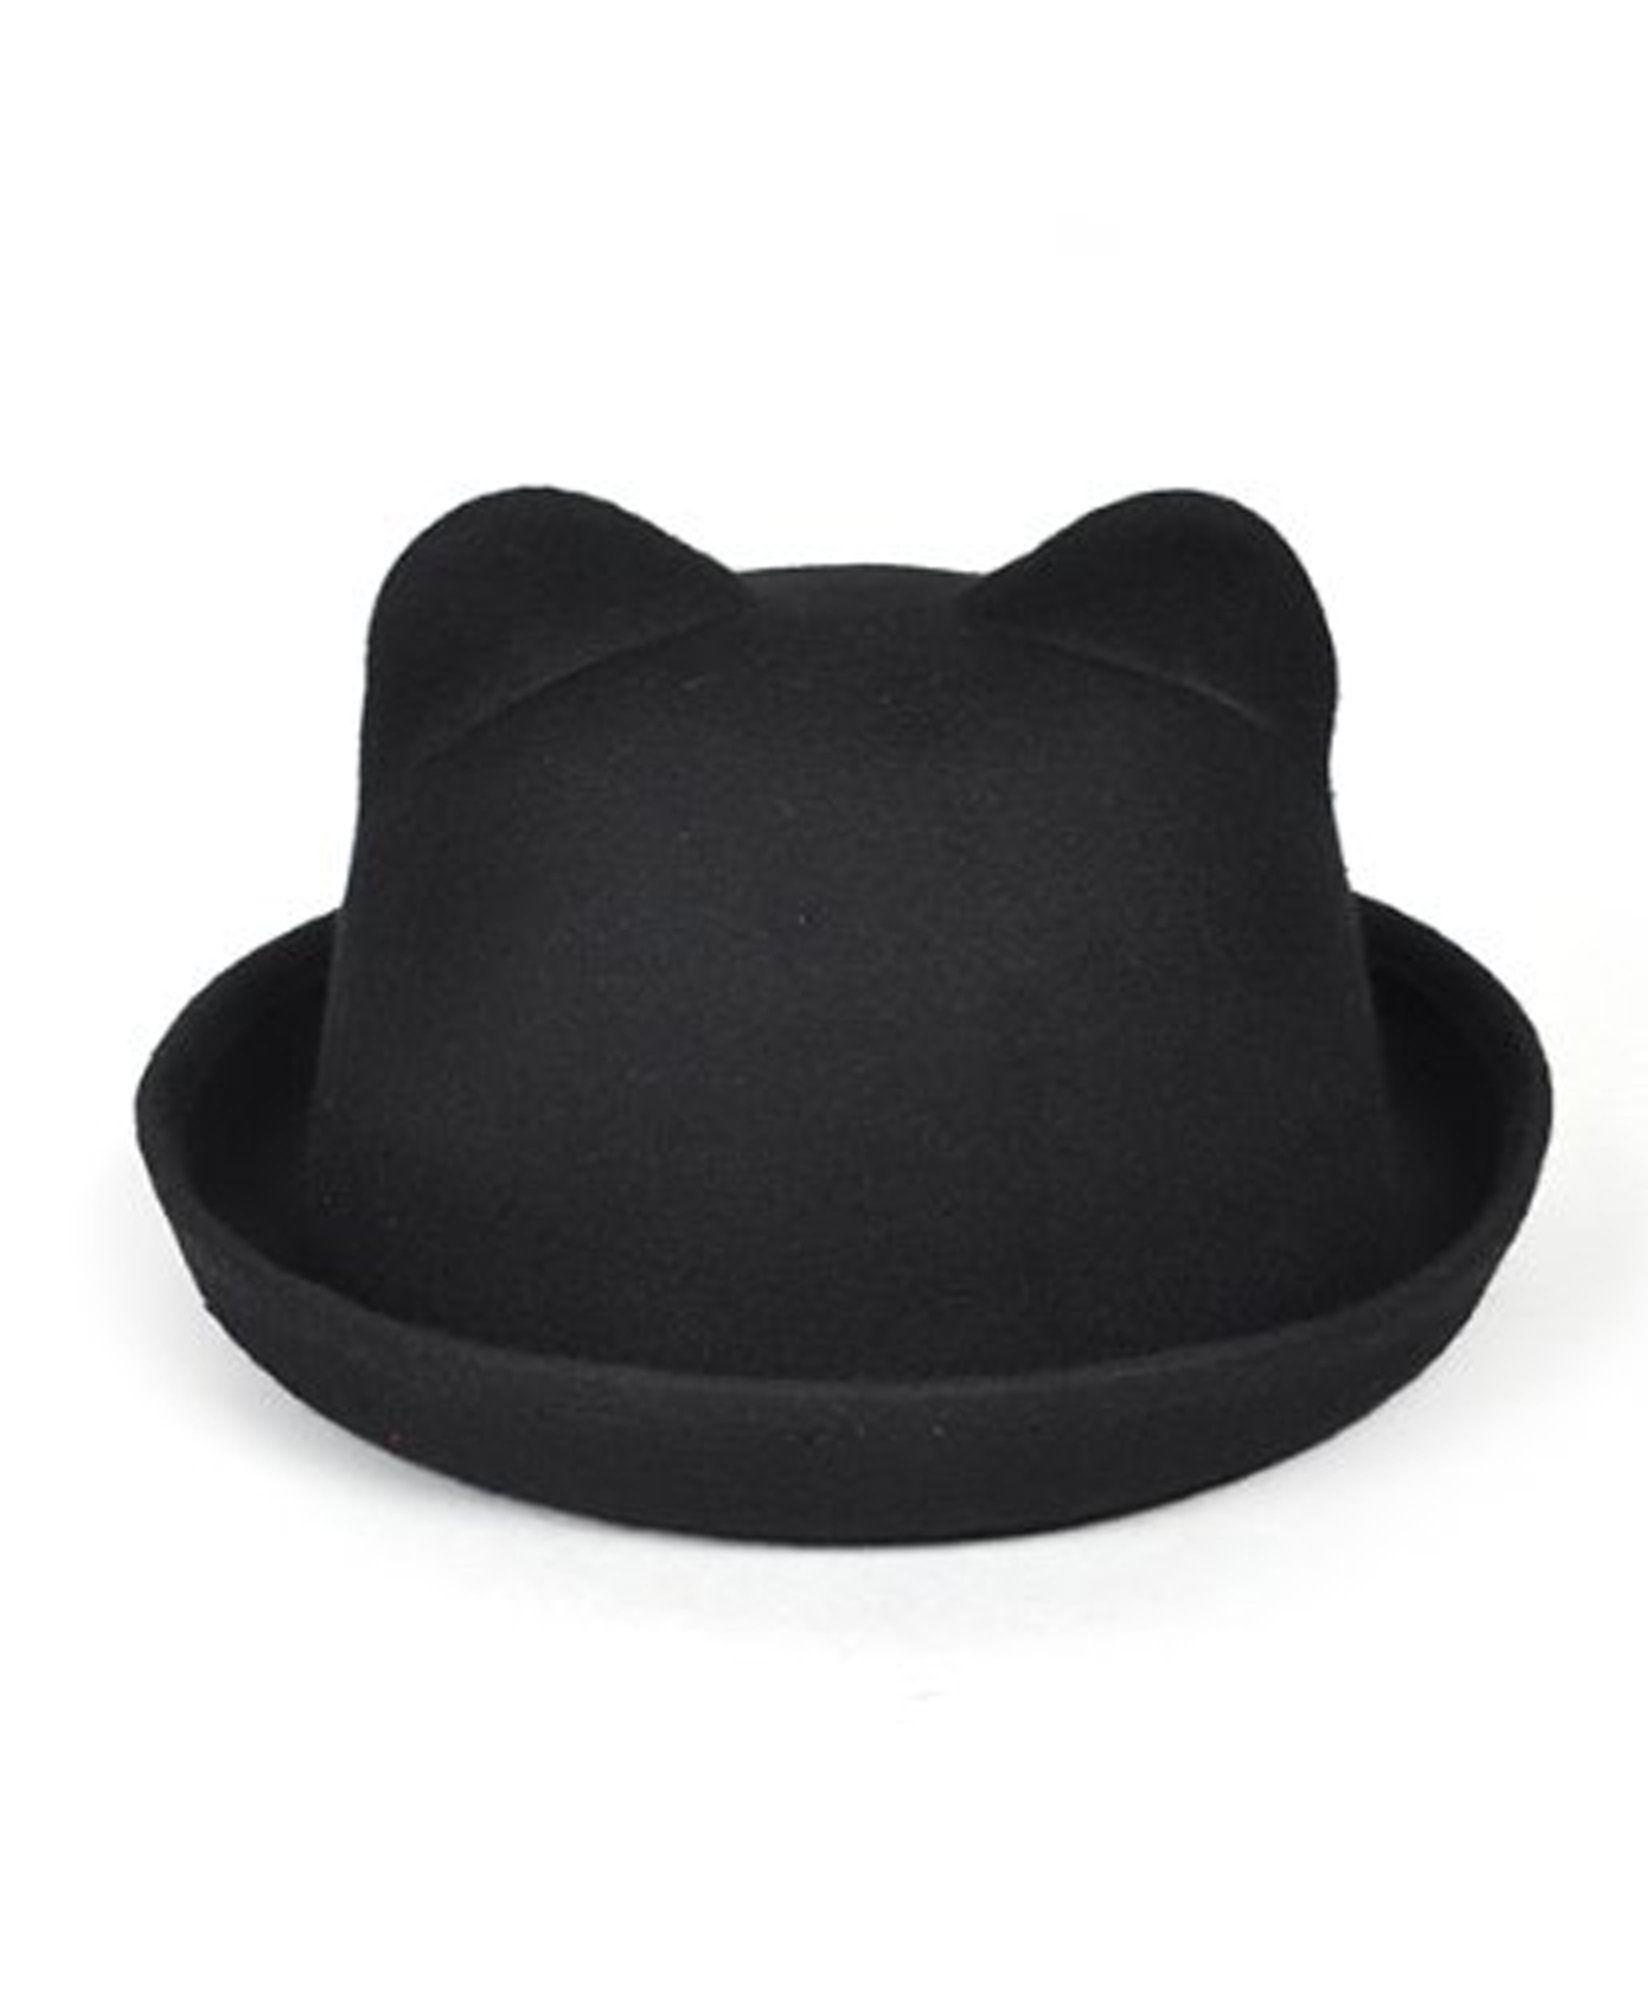 ed585daa33efe7 Black Bear Ears Wool Bowler Derby Hat | Clothes | Bear ears, Ear ...